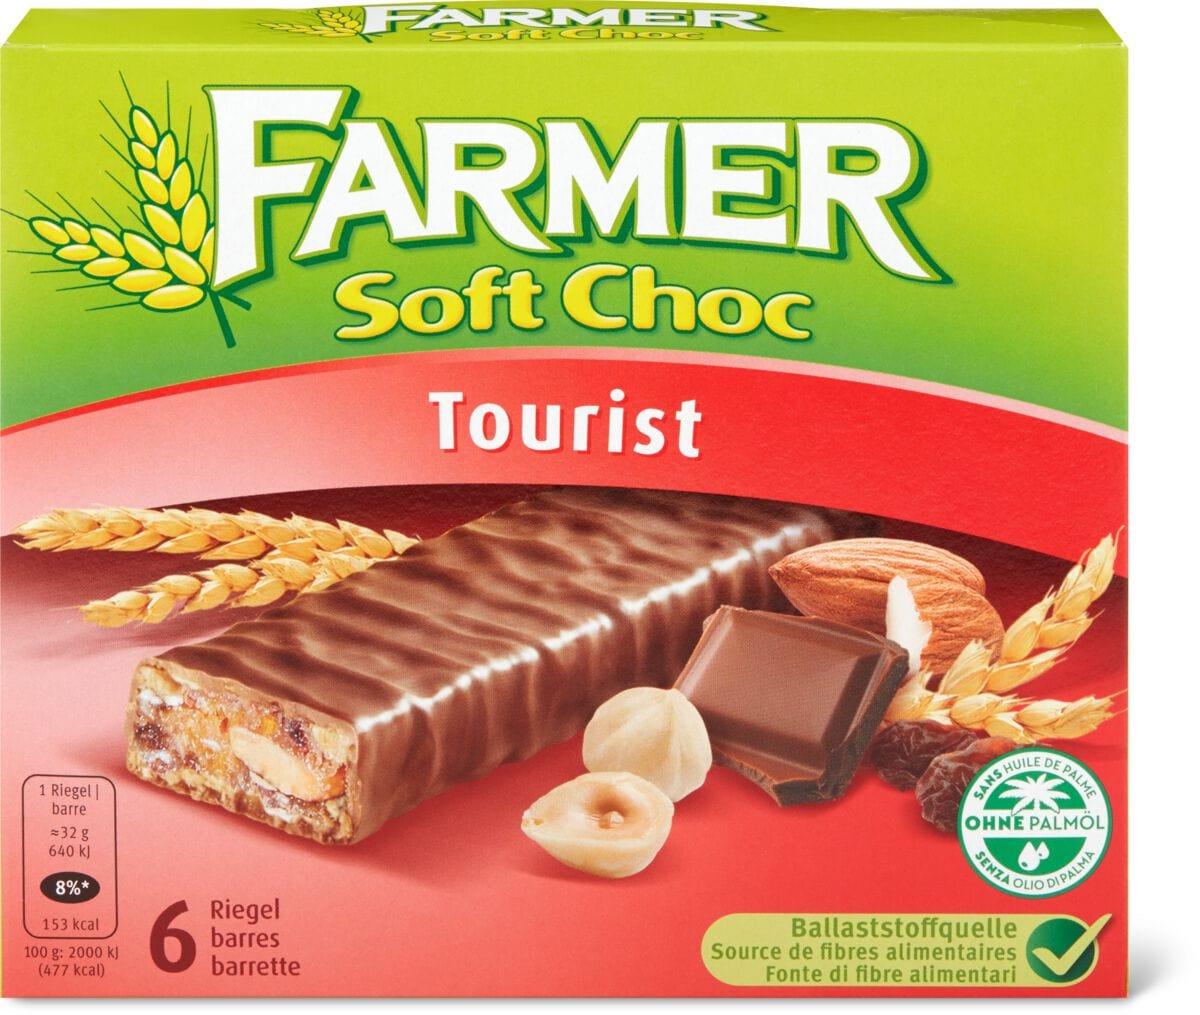 Farmer Soft Choc Tourist